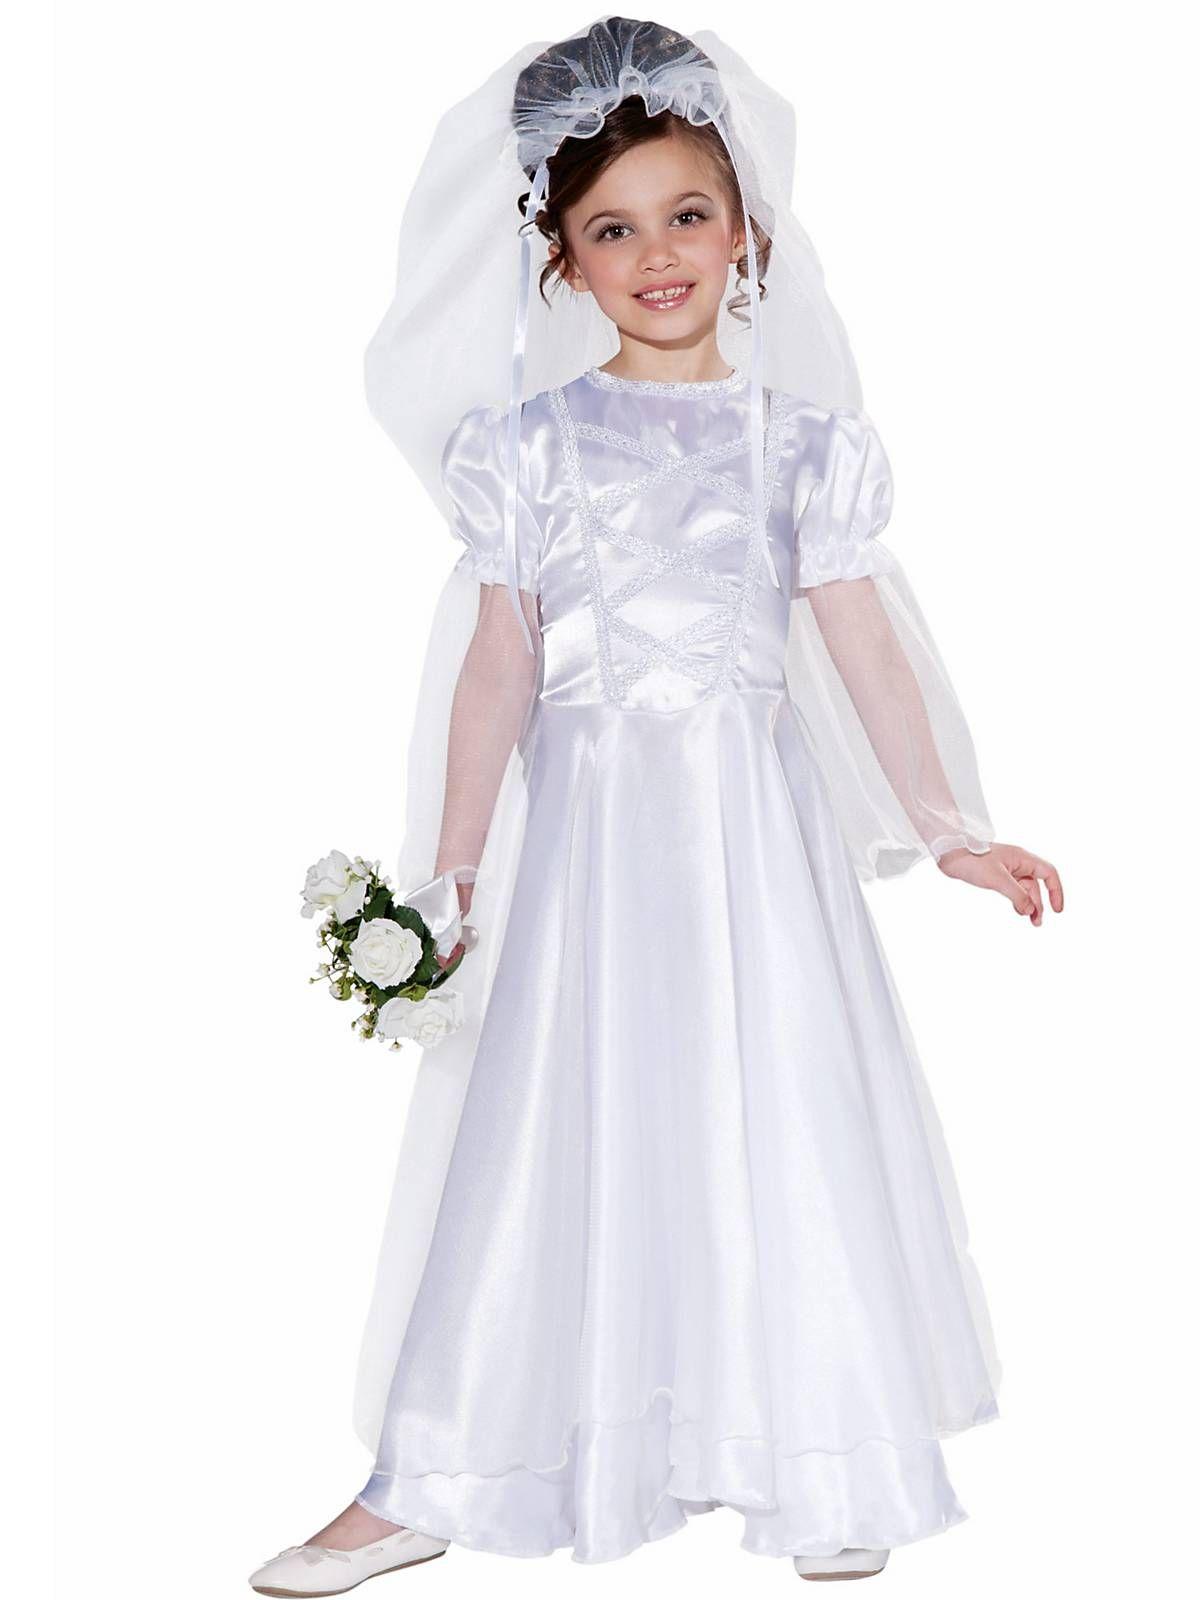 Wedding Belle Girls Costume